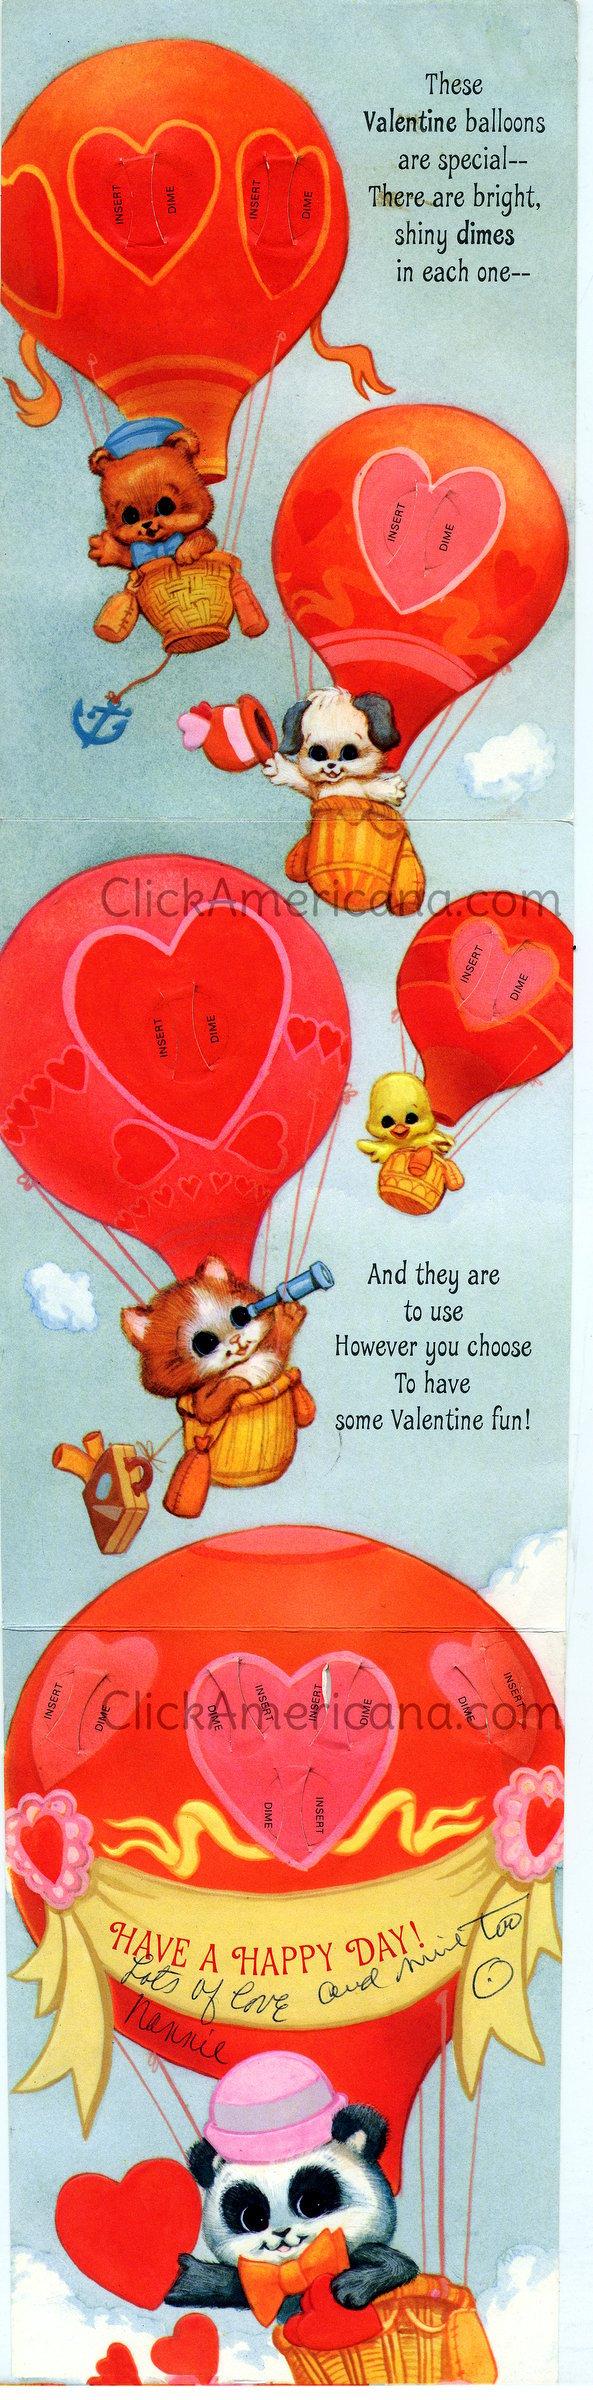 Vintage folded insert dime Valentine's Day card